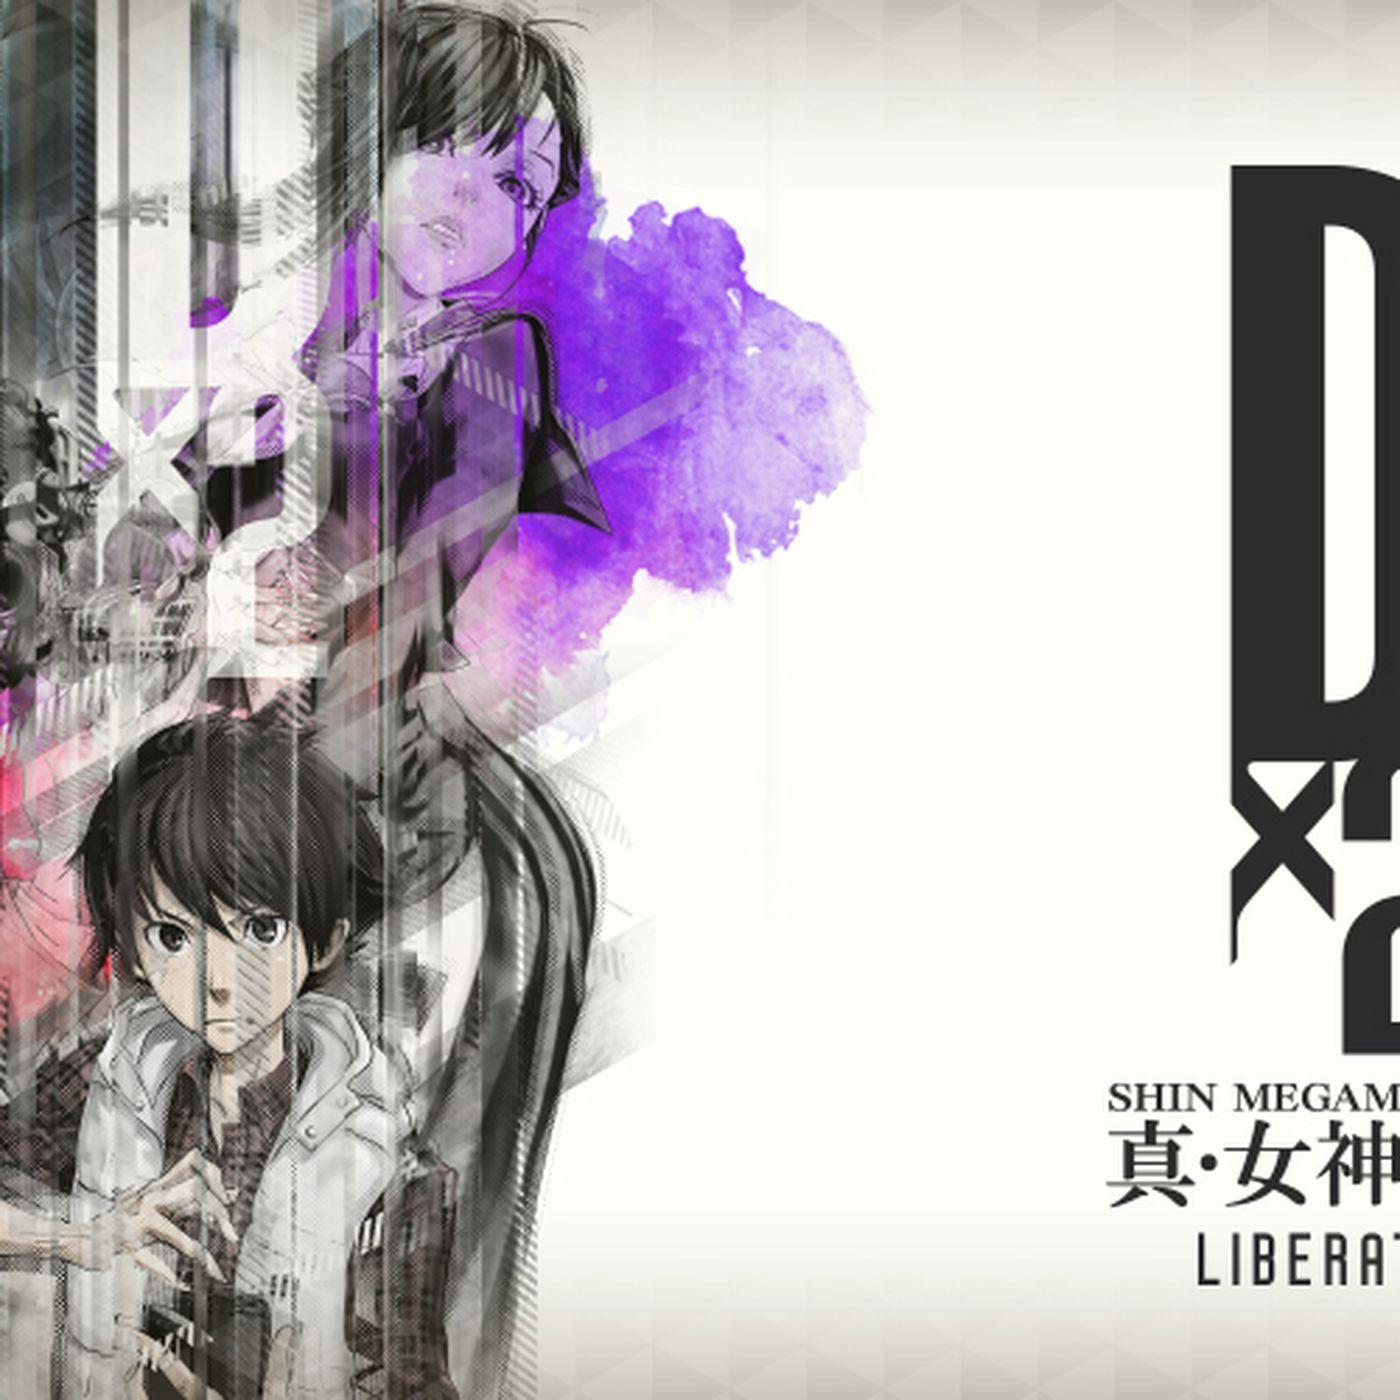 Shin Megami Tensei Liberation Dx2 Review The Verge